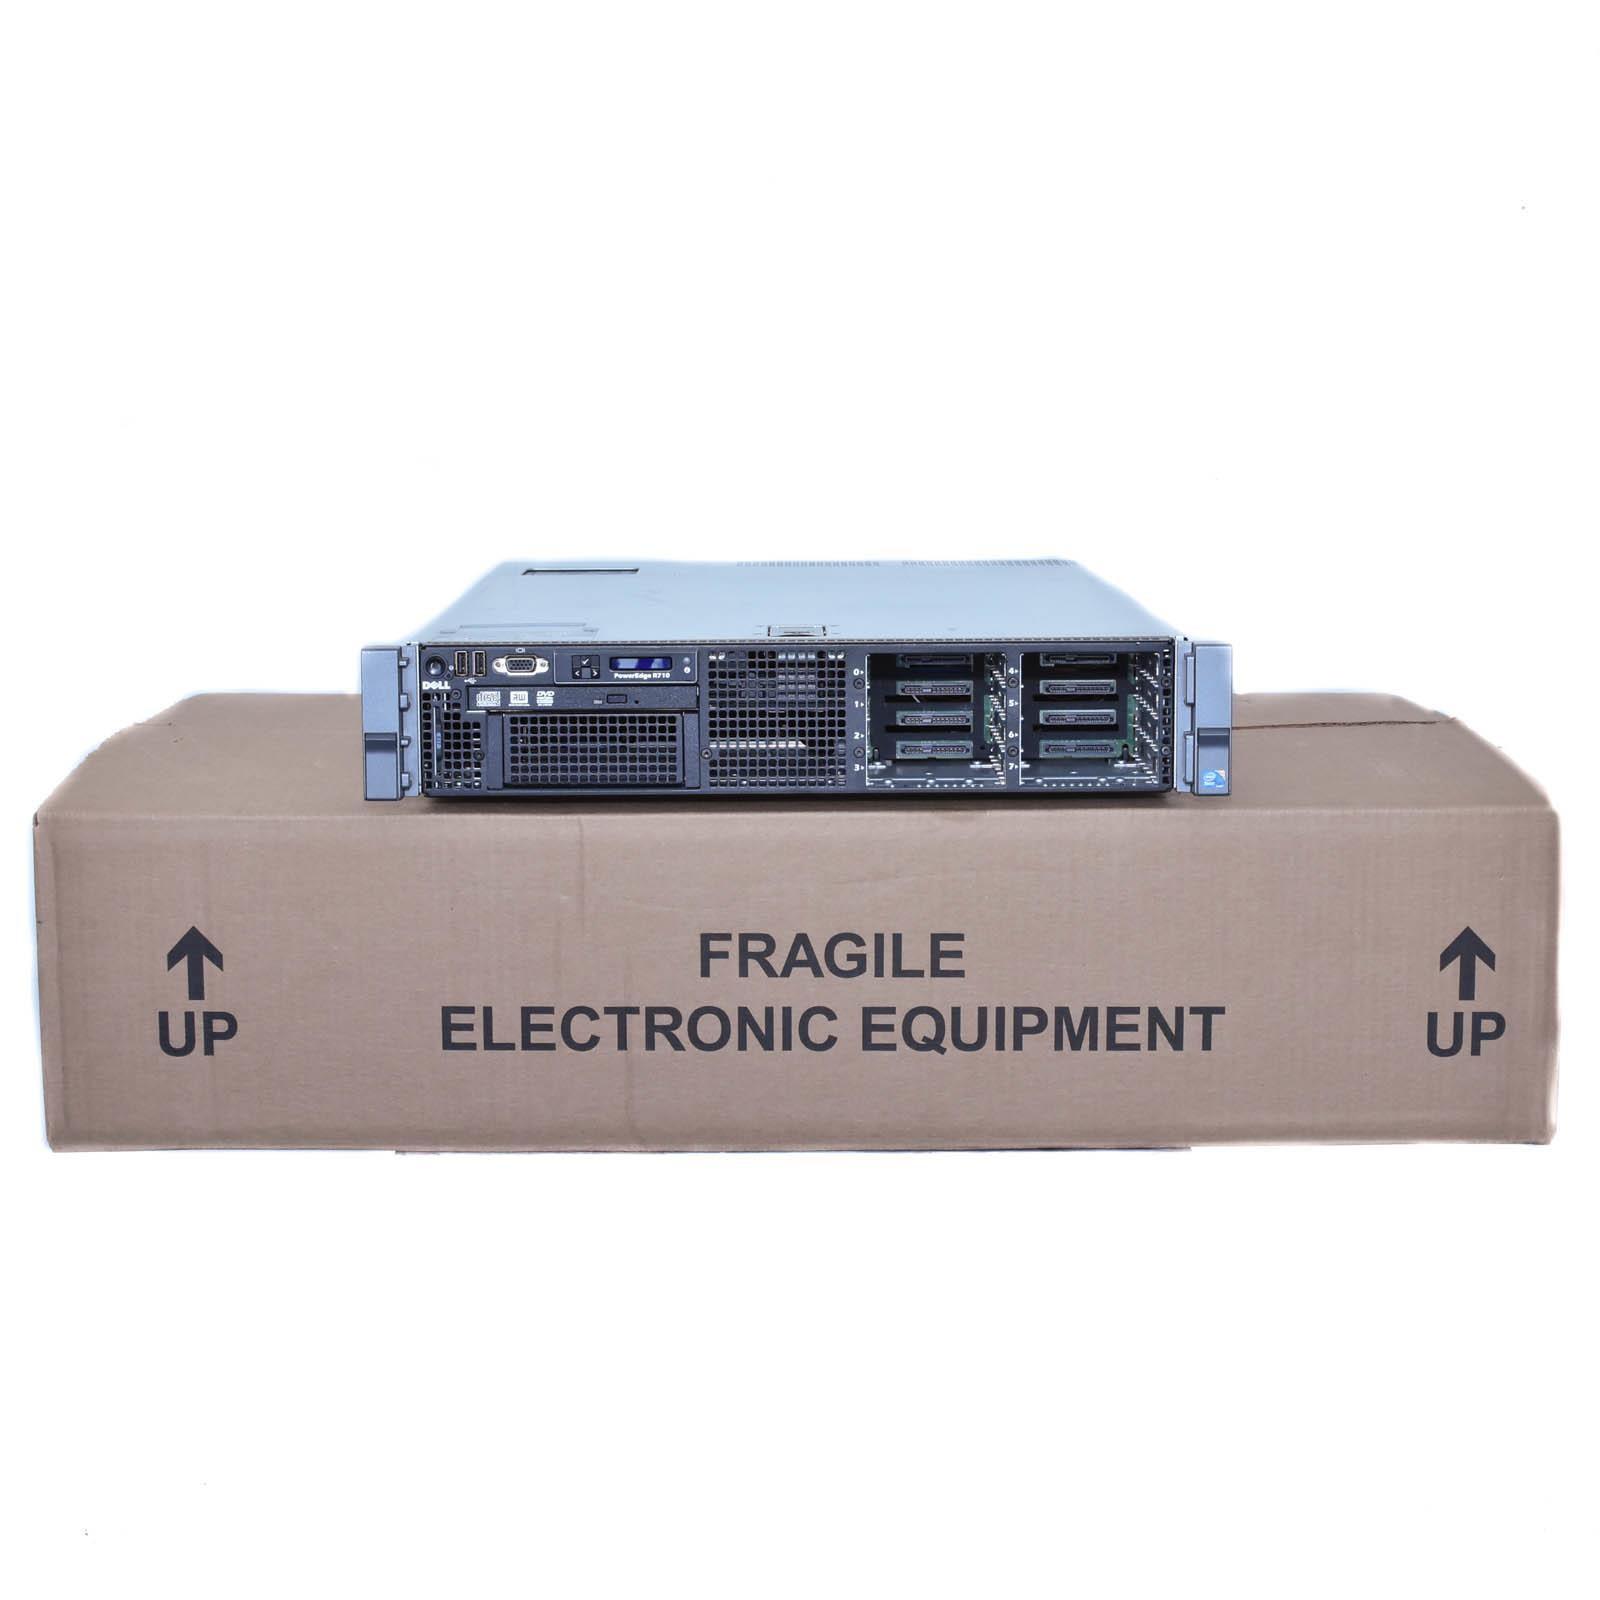 Dell PowerEdge R710 8x2 5